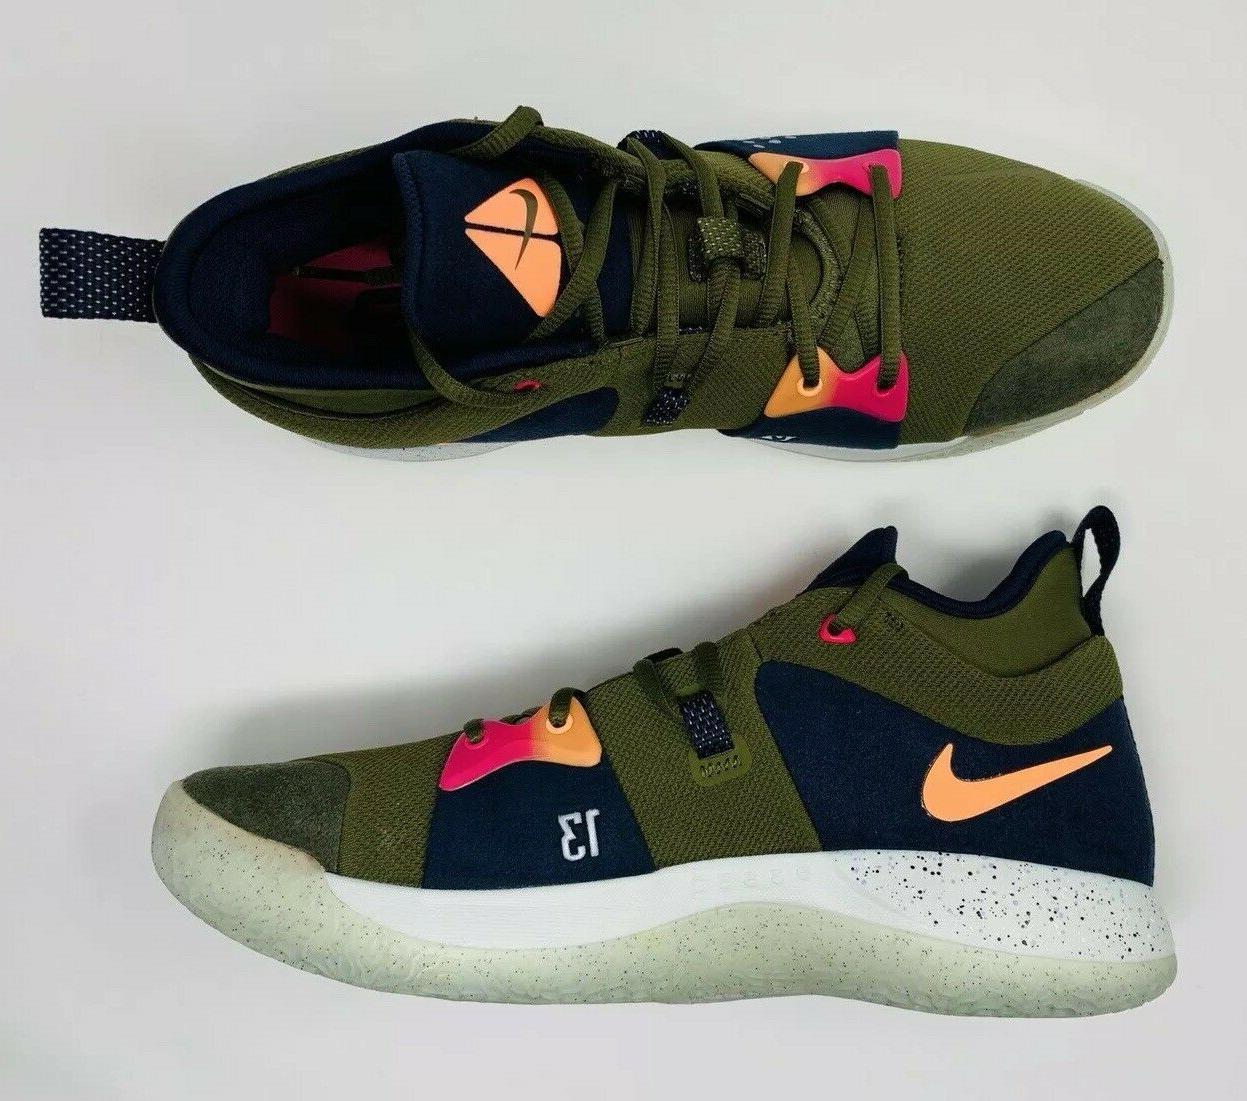 Nike 2 ACG Olive Shoes AJ2039-300 11